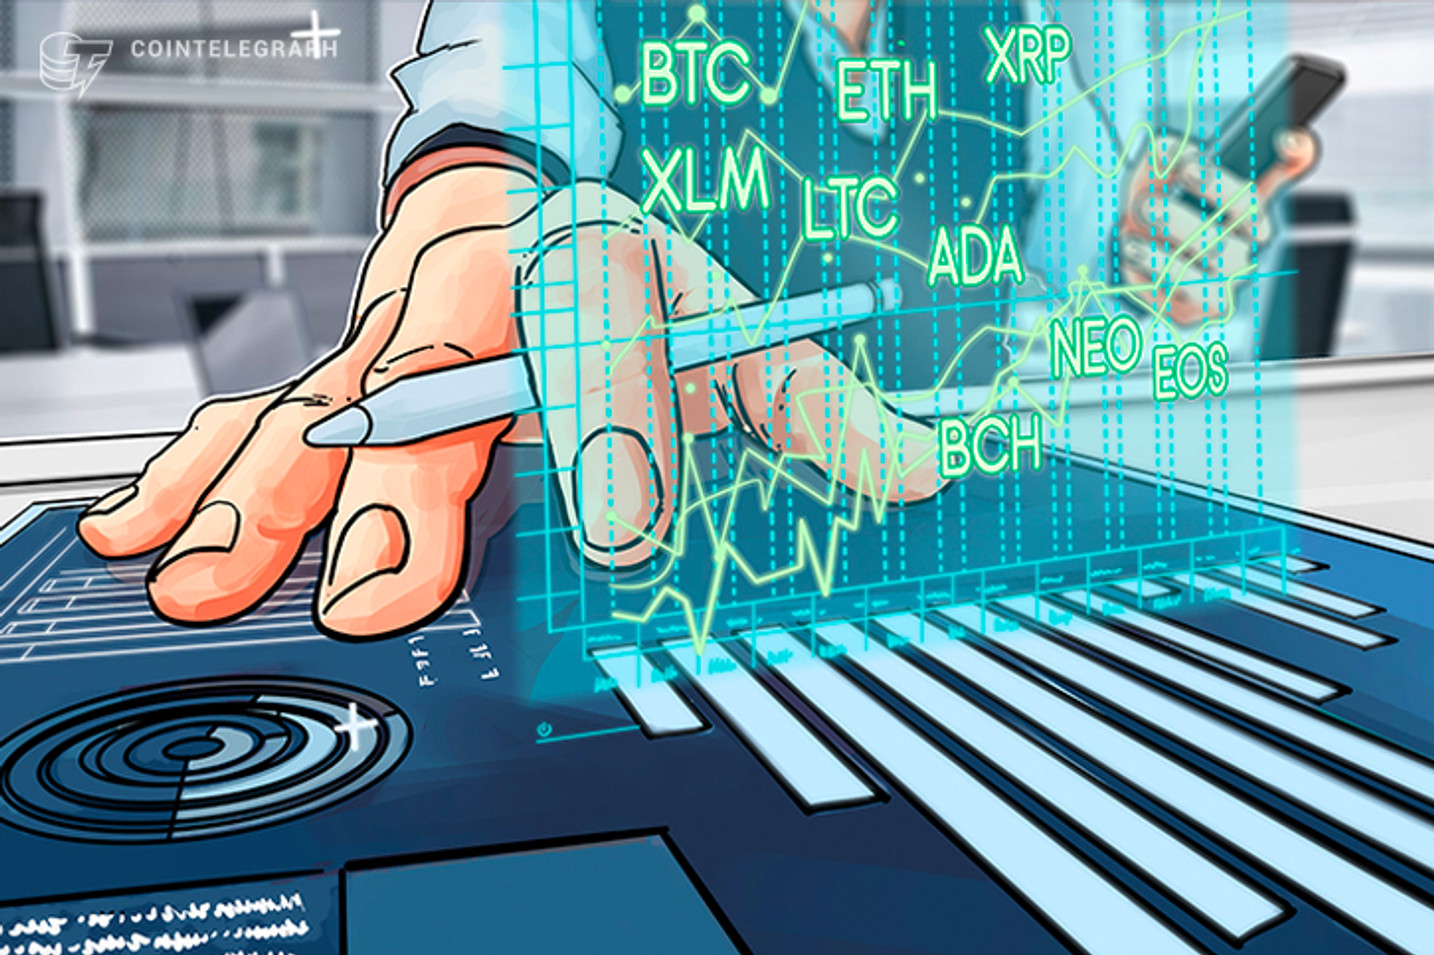 Price Analysis, March 02: Bitcoin, Ethereum, Bitcoin Cash, Ripple, Stellar, Litecoin, Cardano, NEO, EOS